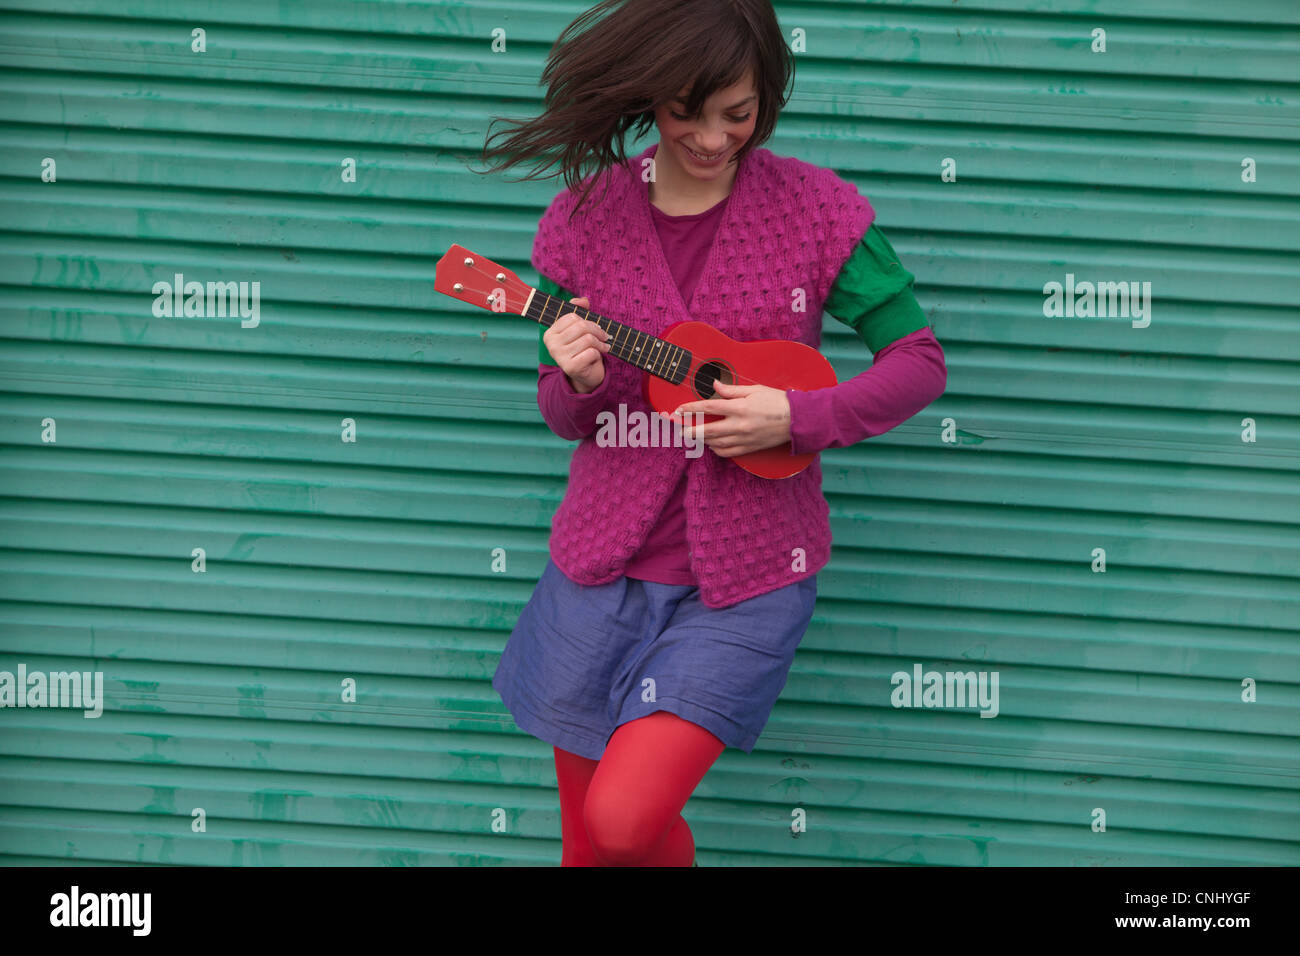 Chica jugando ukulele Imagen De Stock